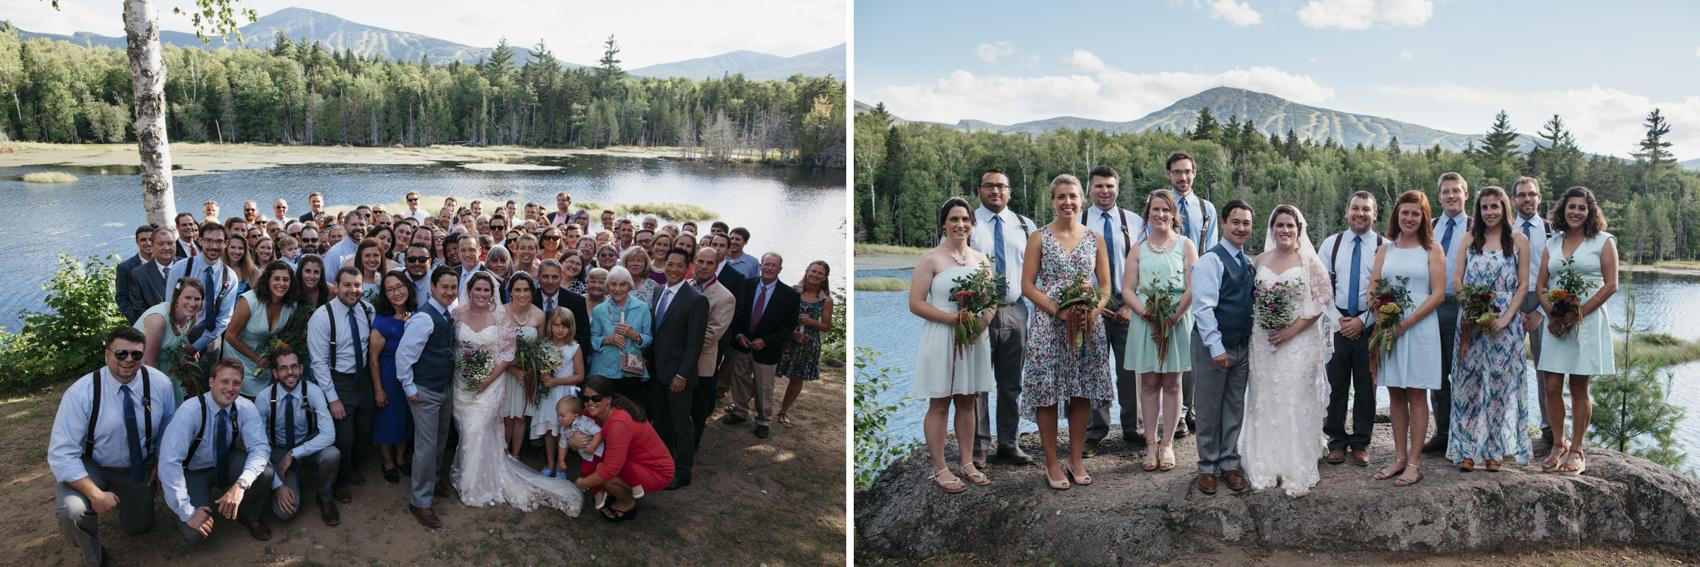 LFA_JuliaGlenn_Sugarloaf_Maine_Wedding013.jpg